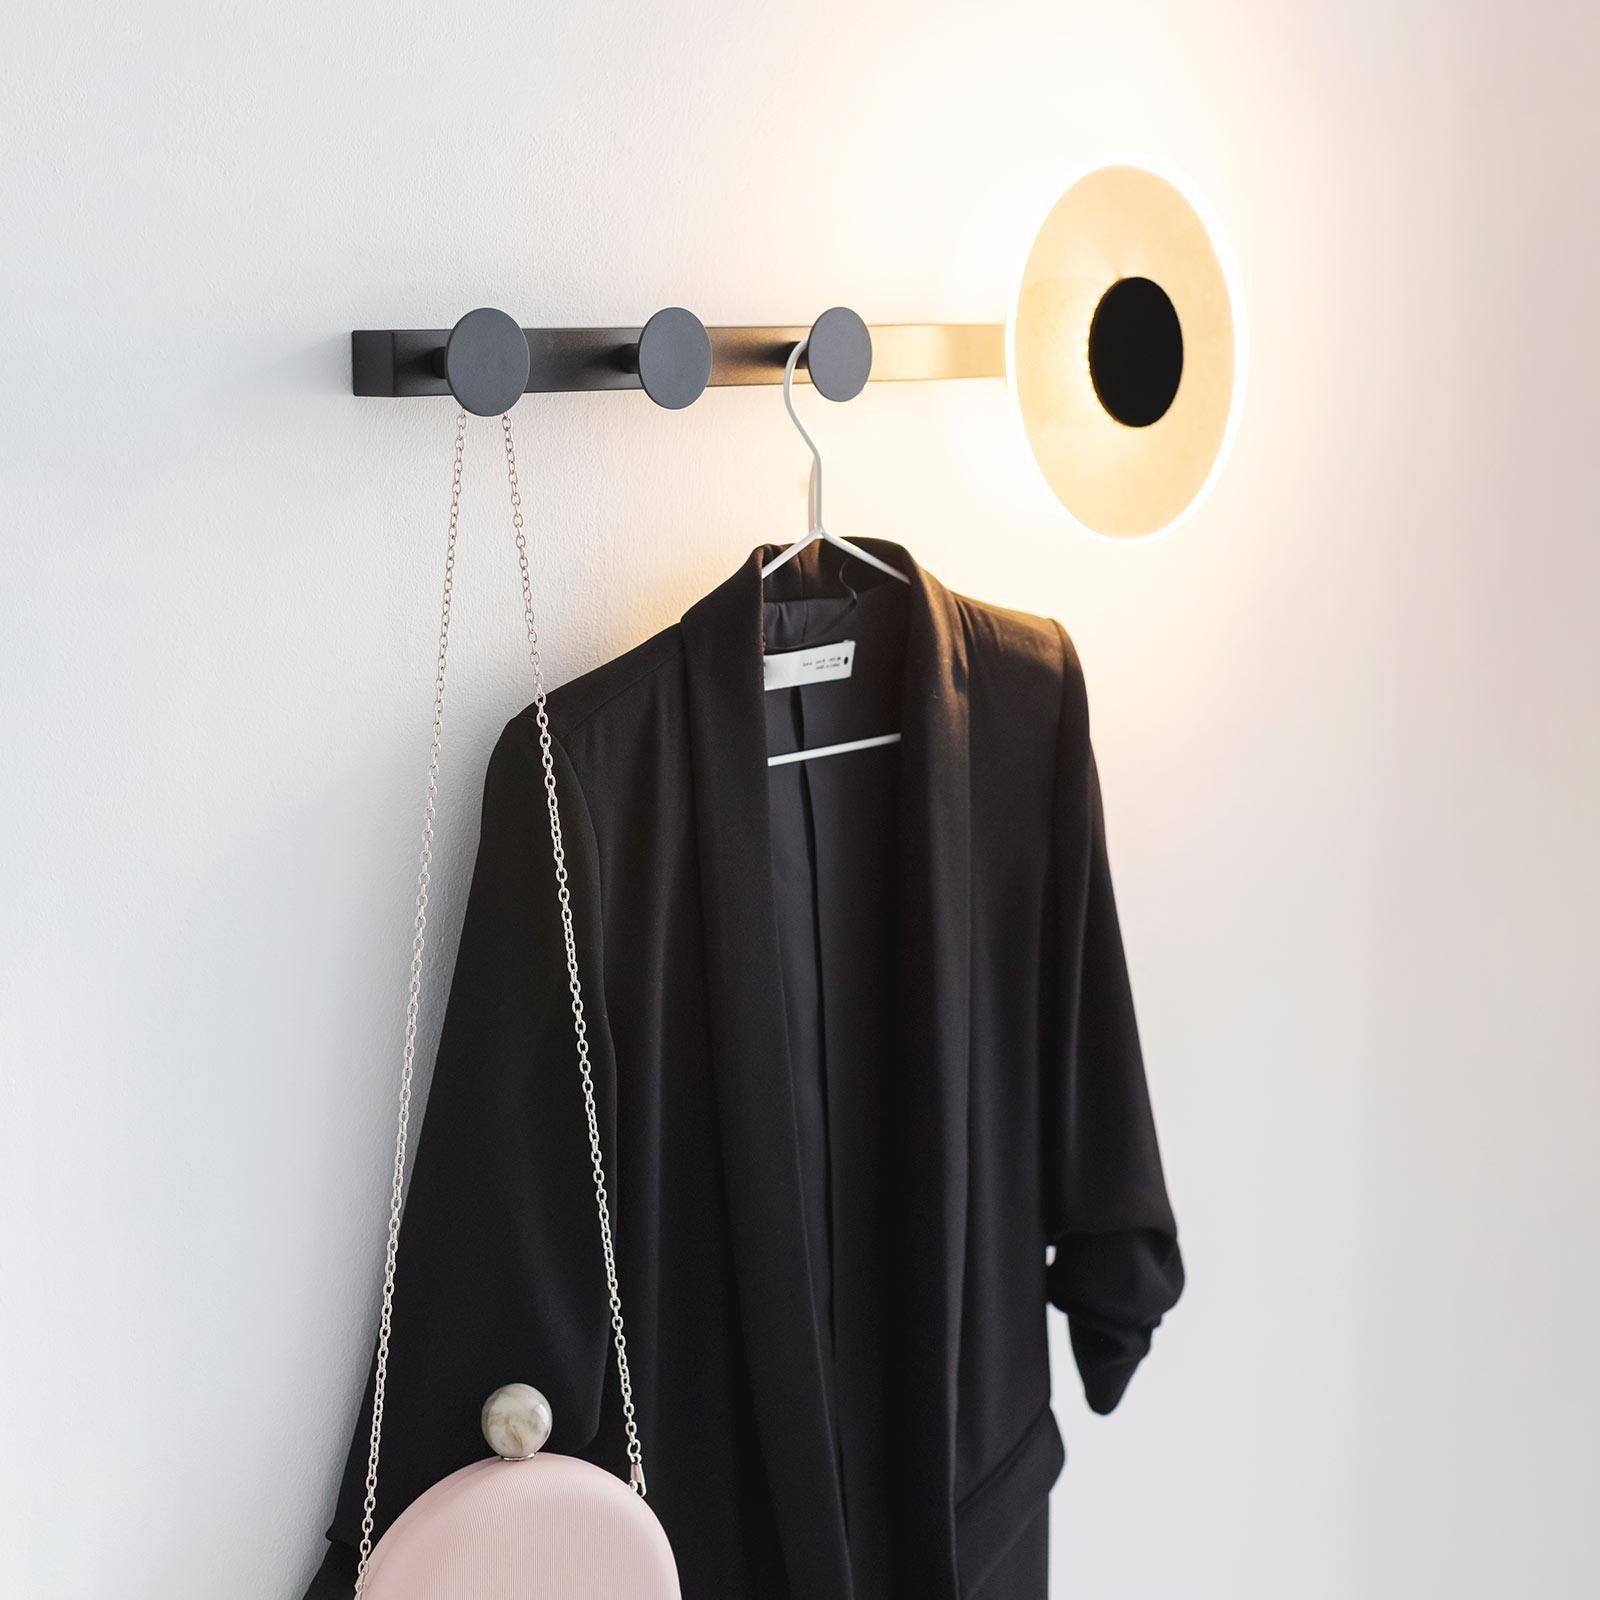 LED wandlamp Venus, met kledinghaak, zwart